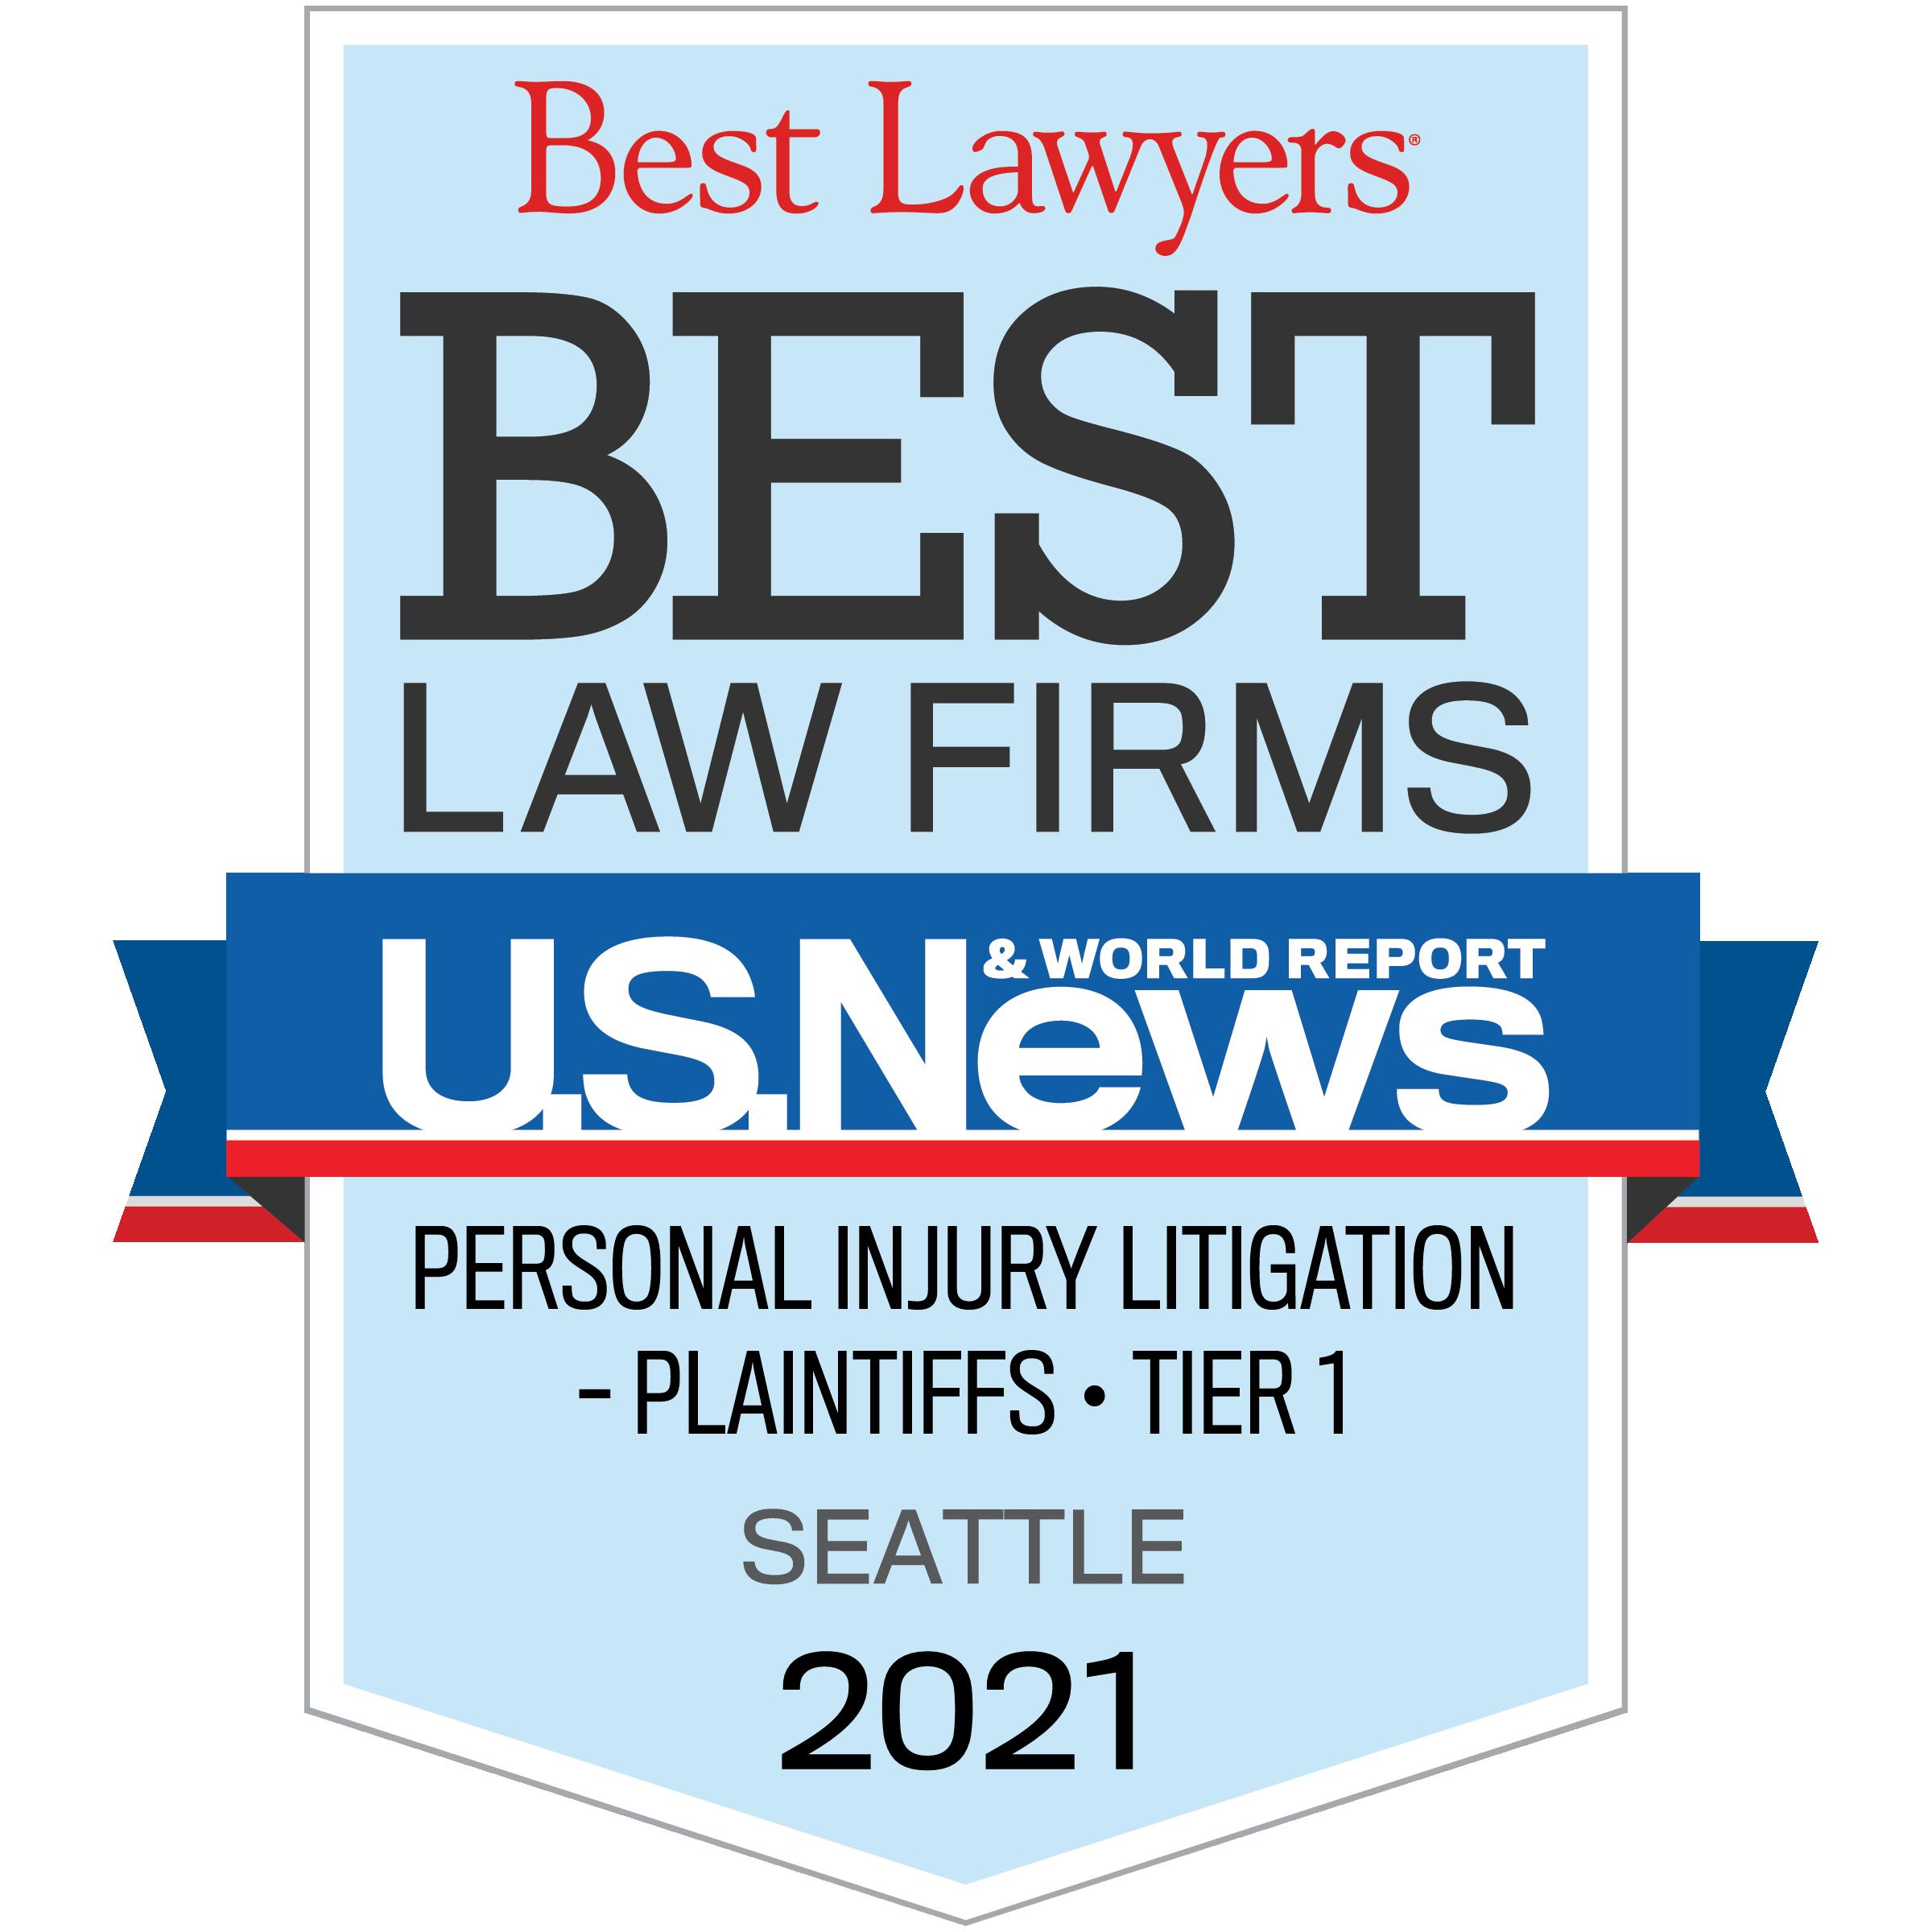 Best Lawyers - US News 2021